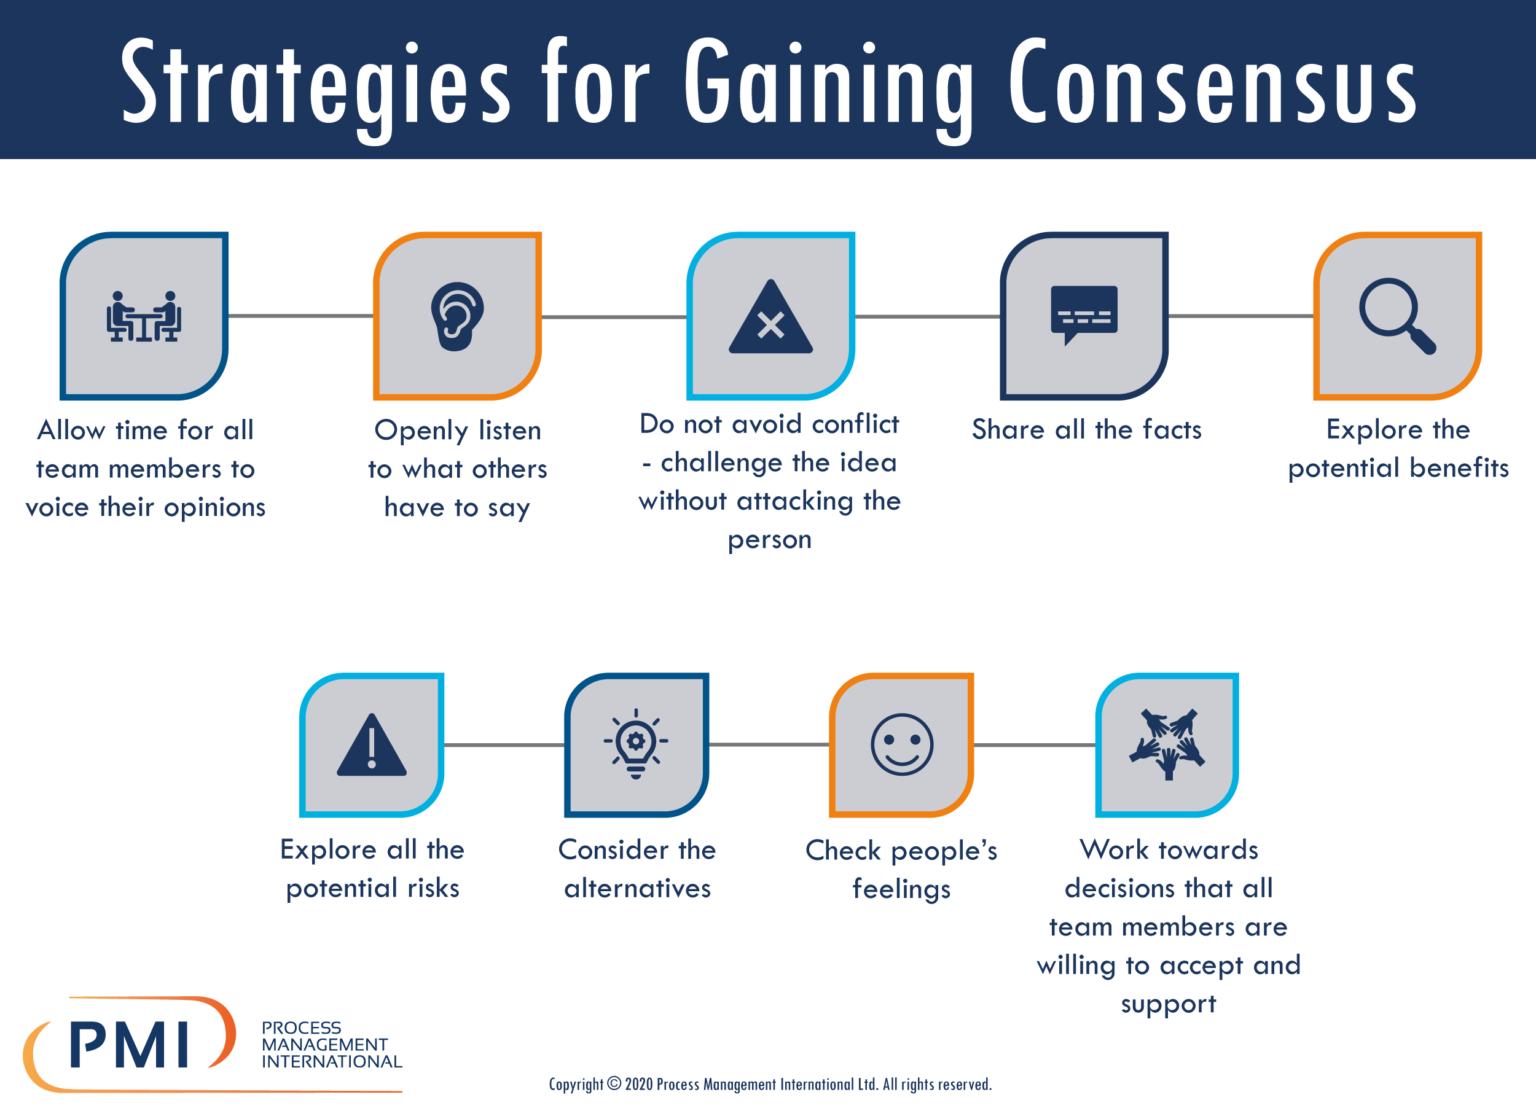 Strategies for Gaining Consensus Infographic